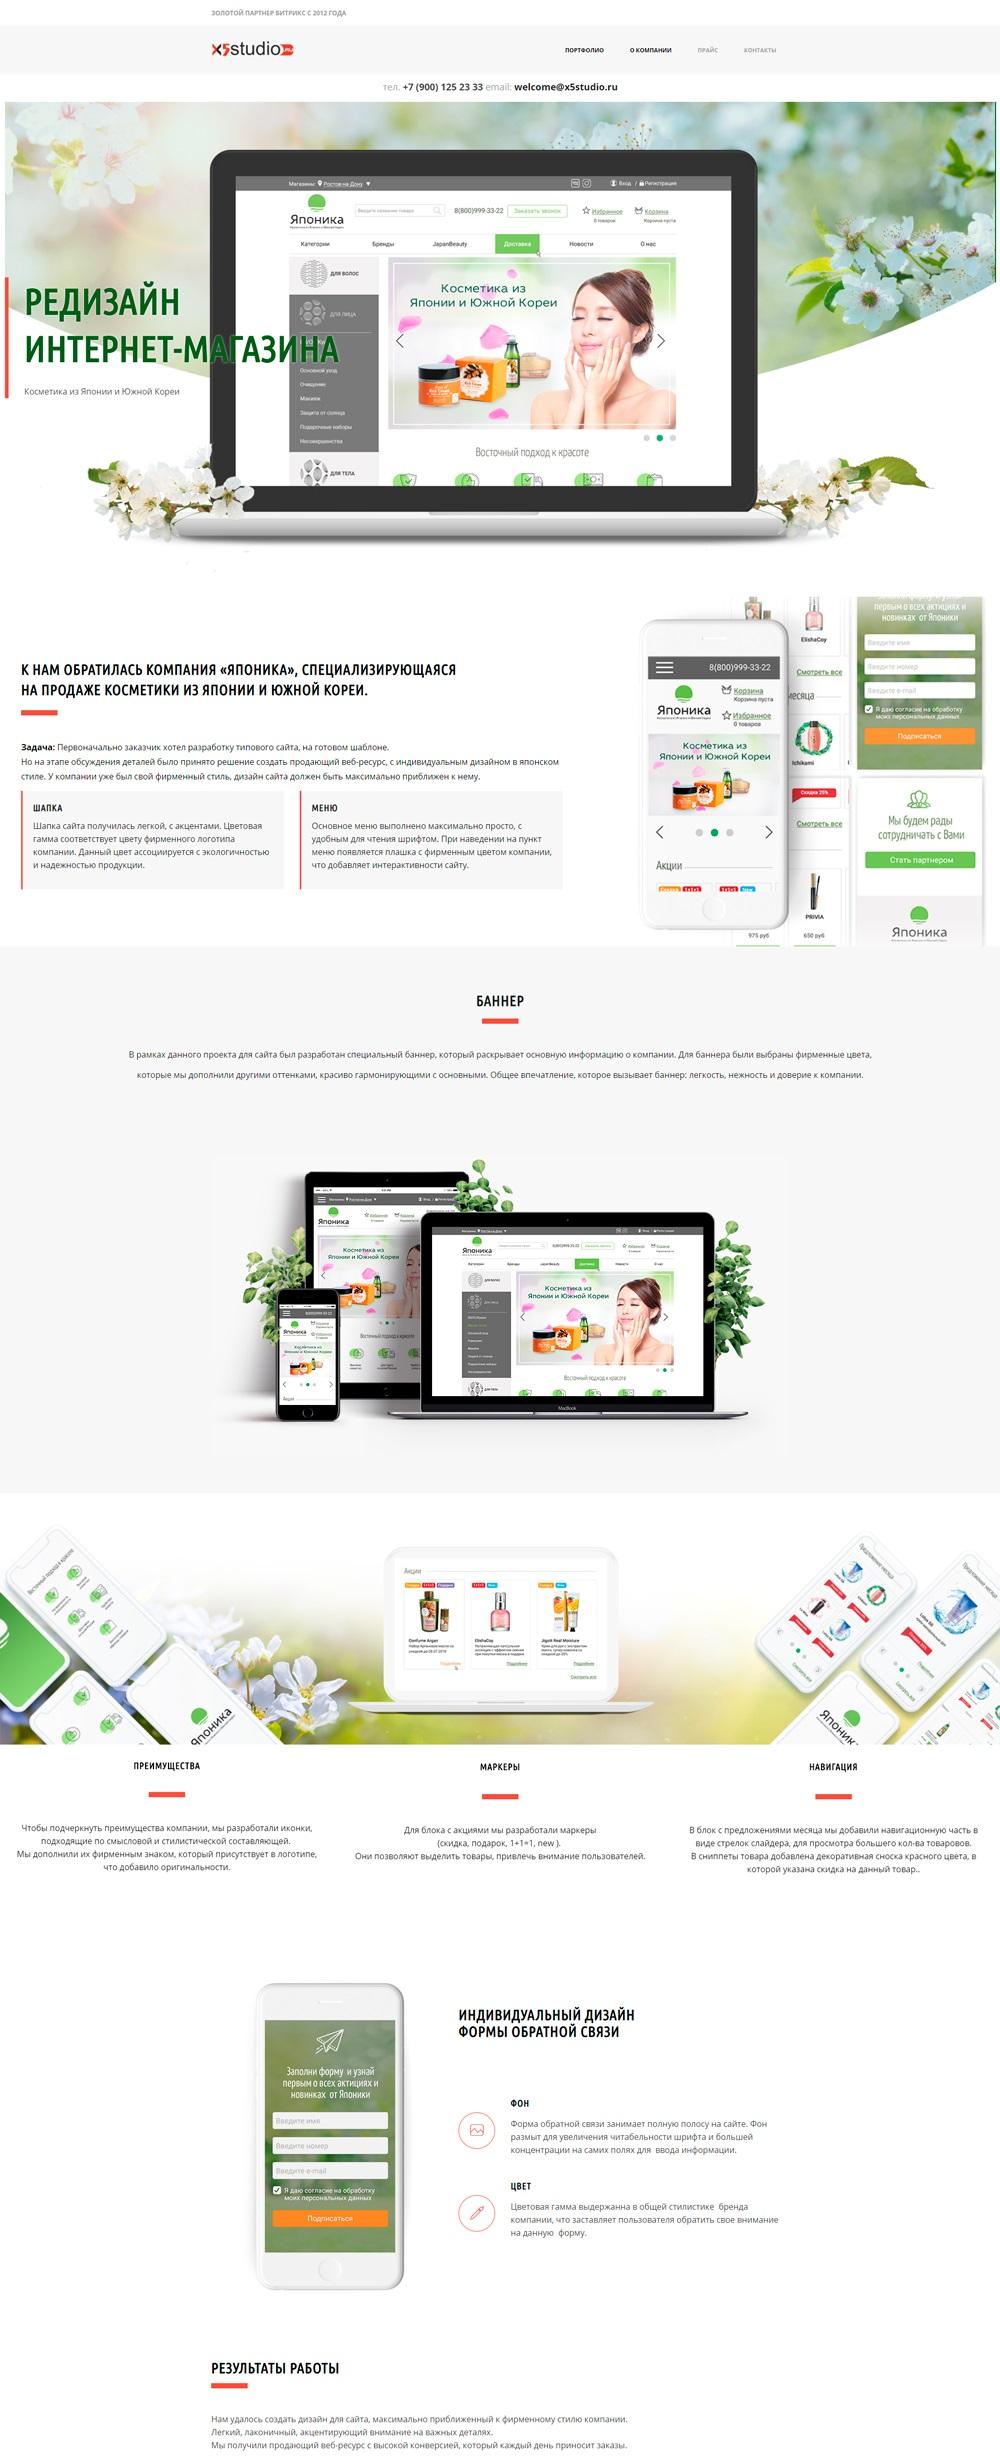 Редизайн интернет-магазина Японика